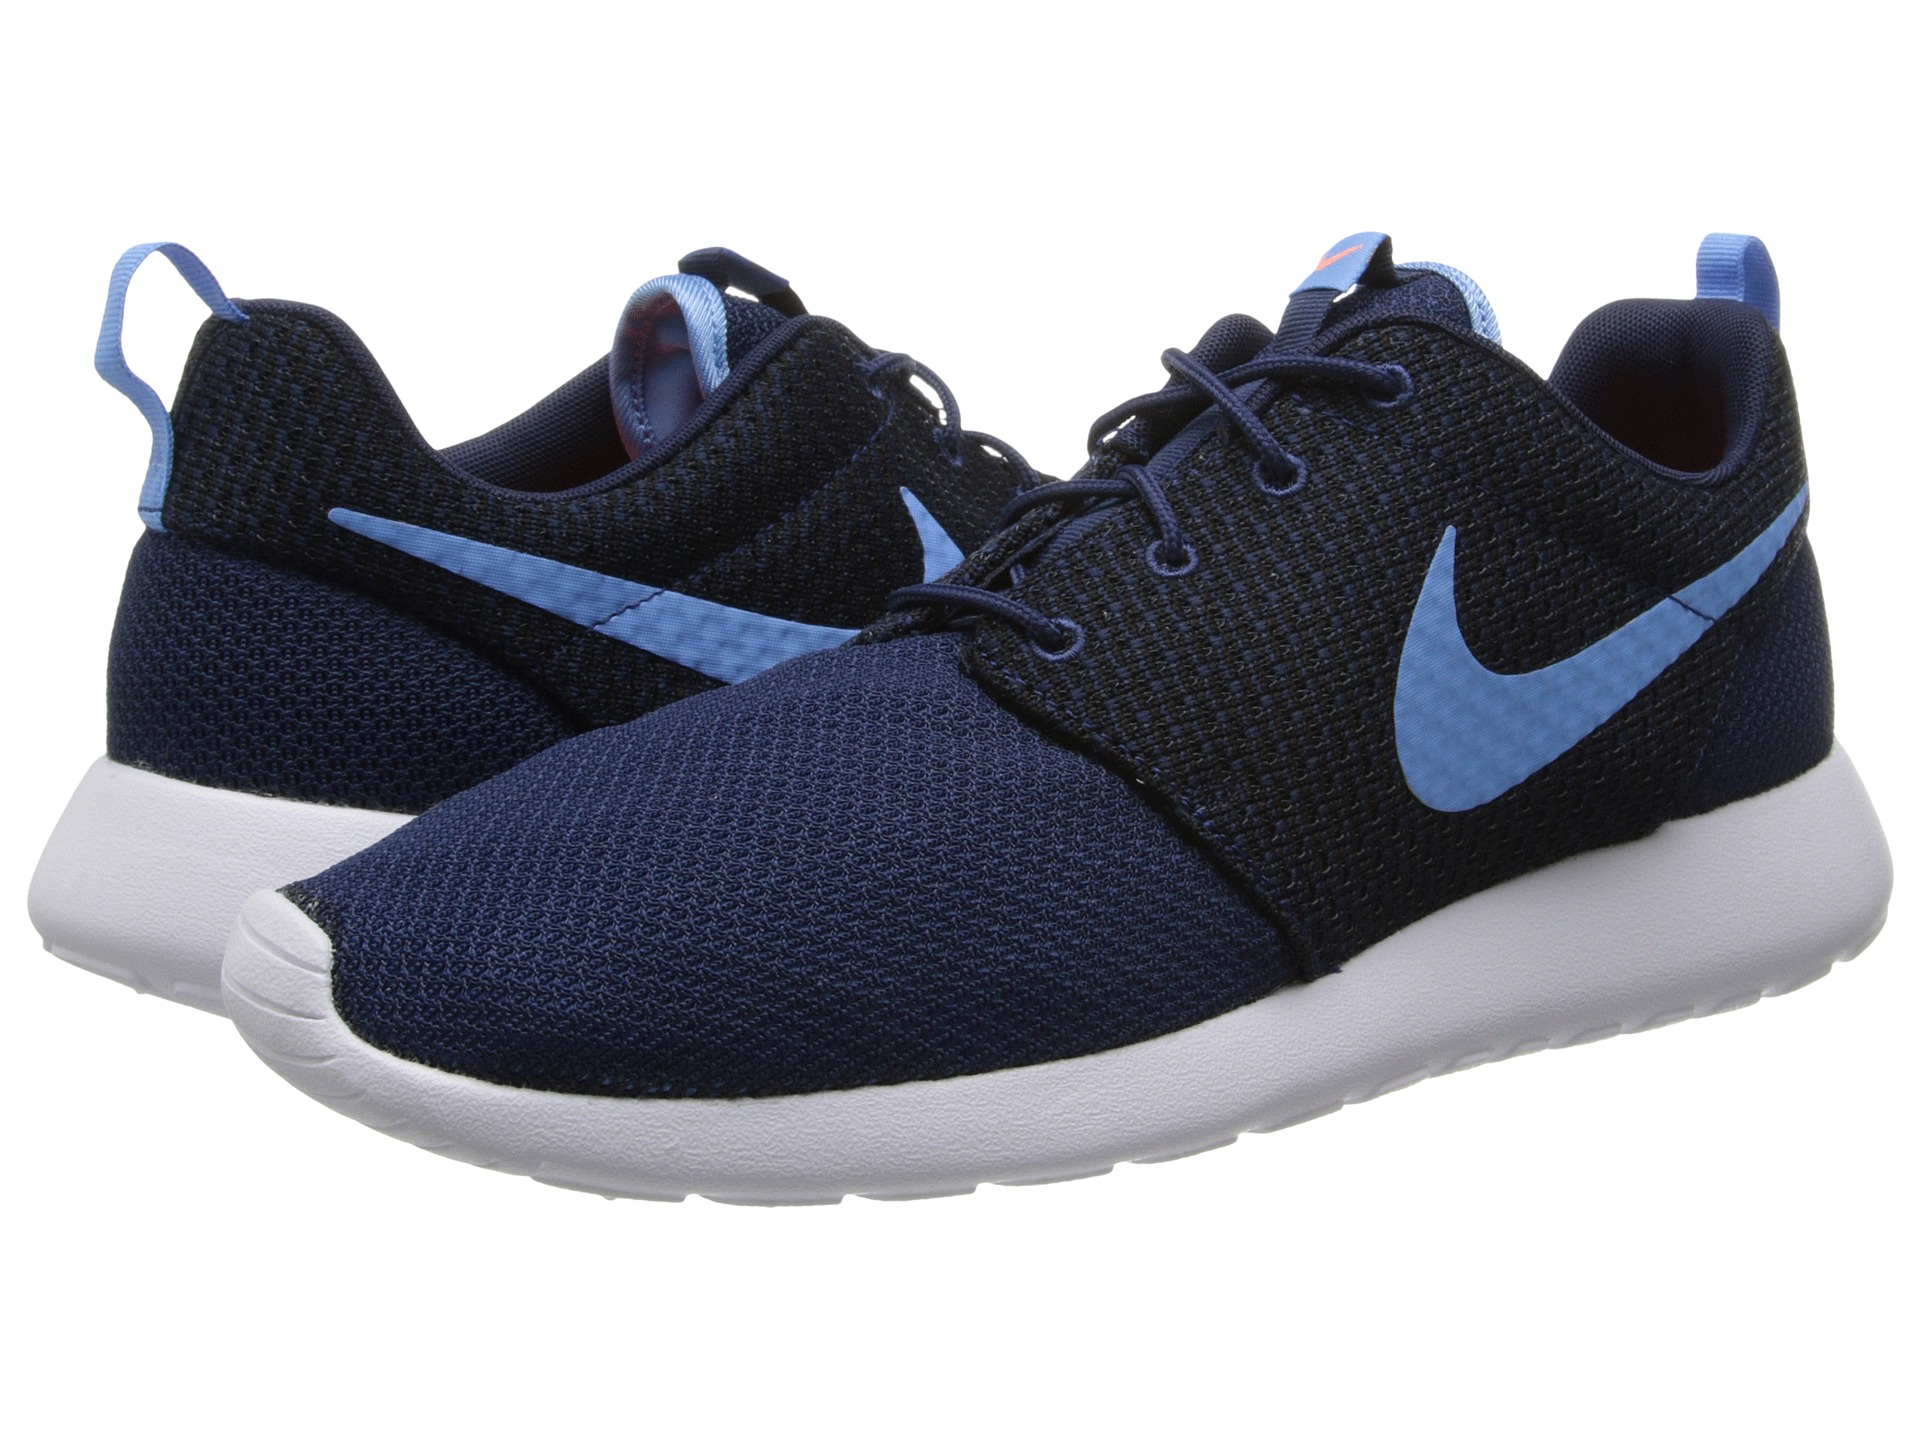 nike blue roshe run product 1 21885335 2 729524367 normal